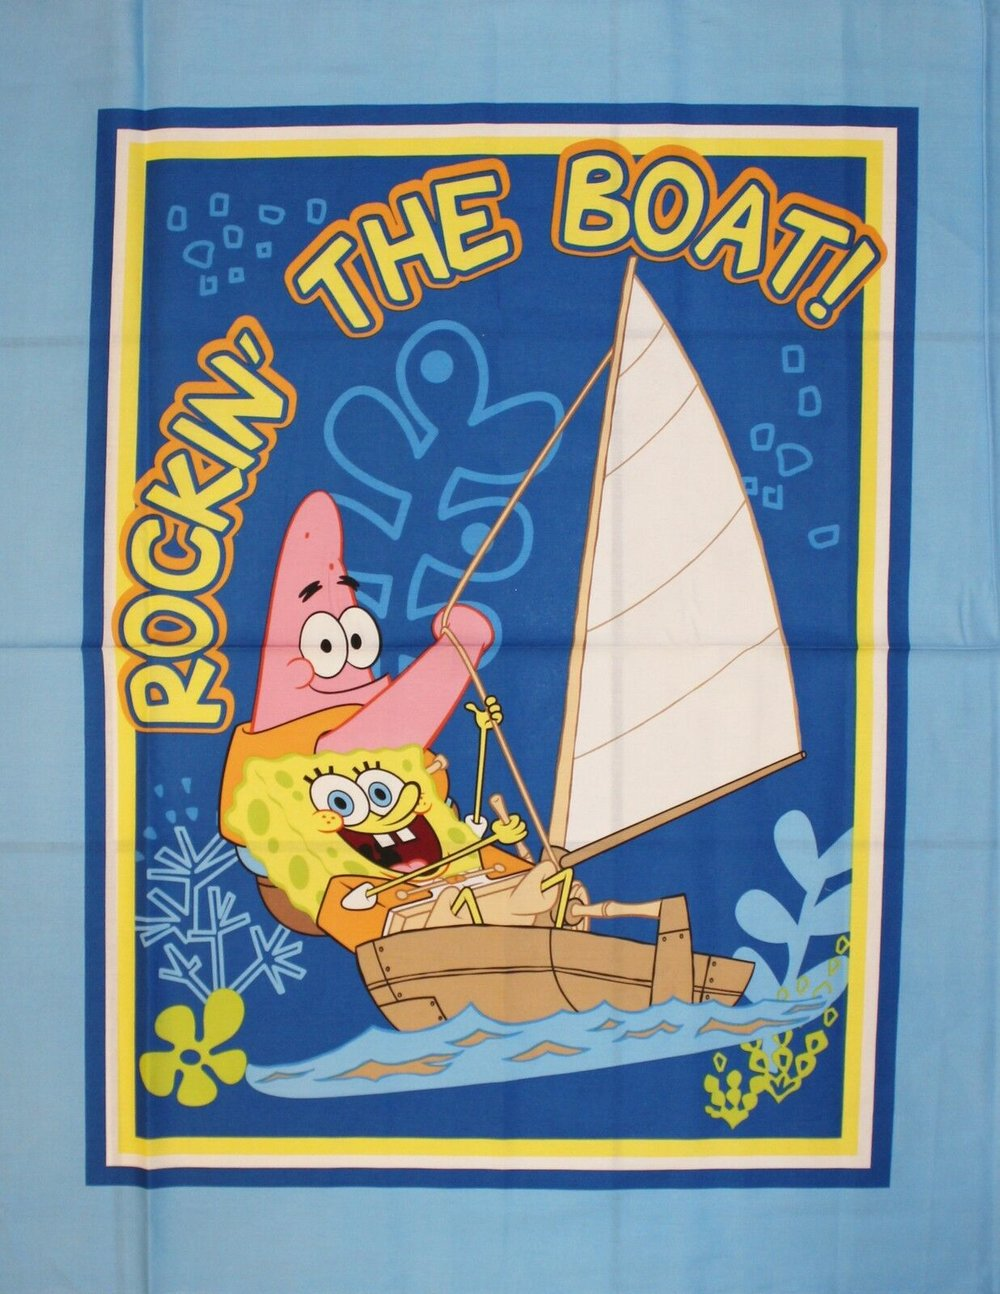 Sponge Bob Rockin' the Boat by Springs Creative